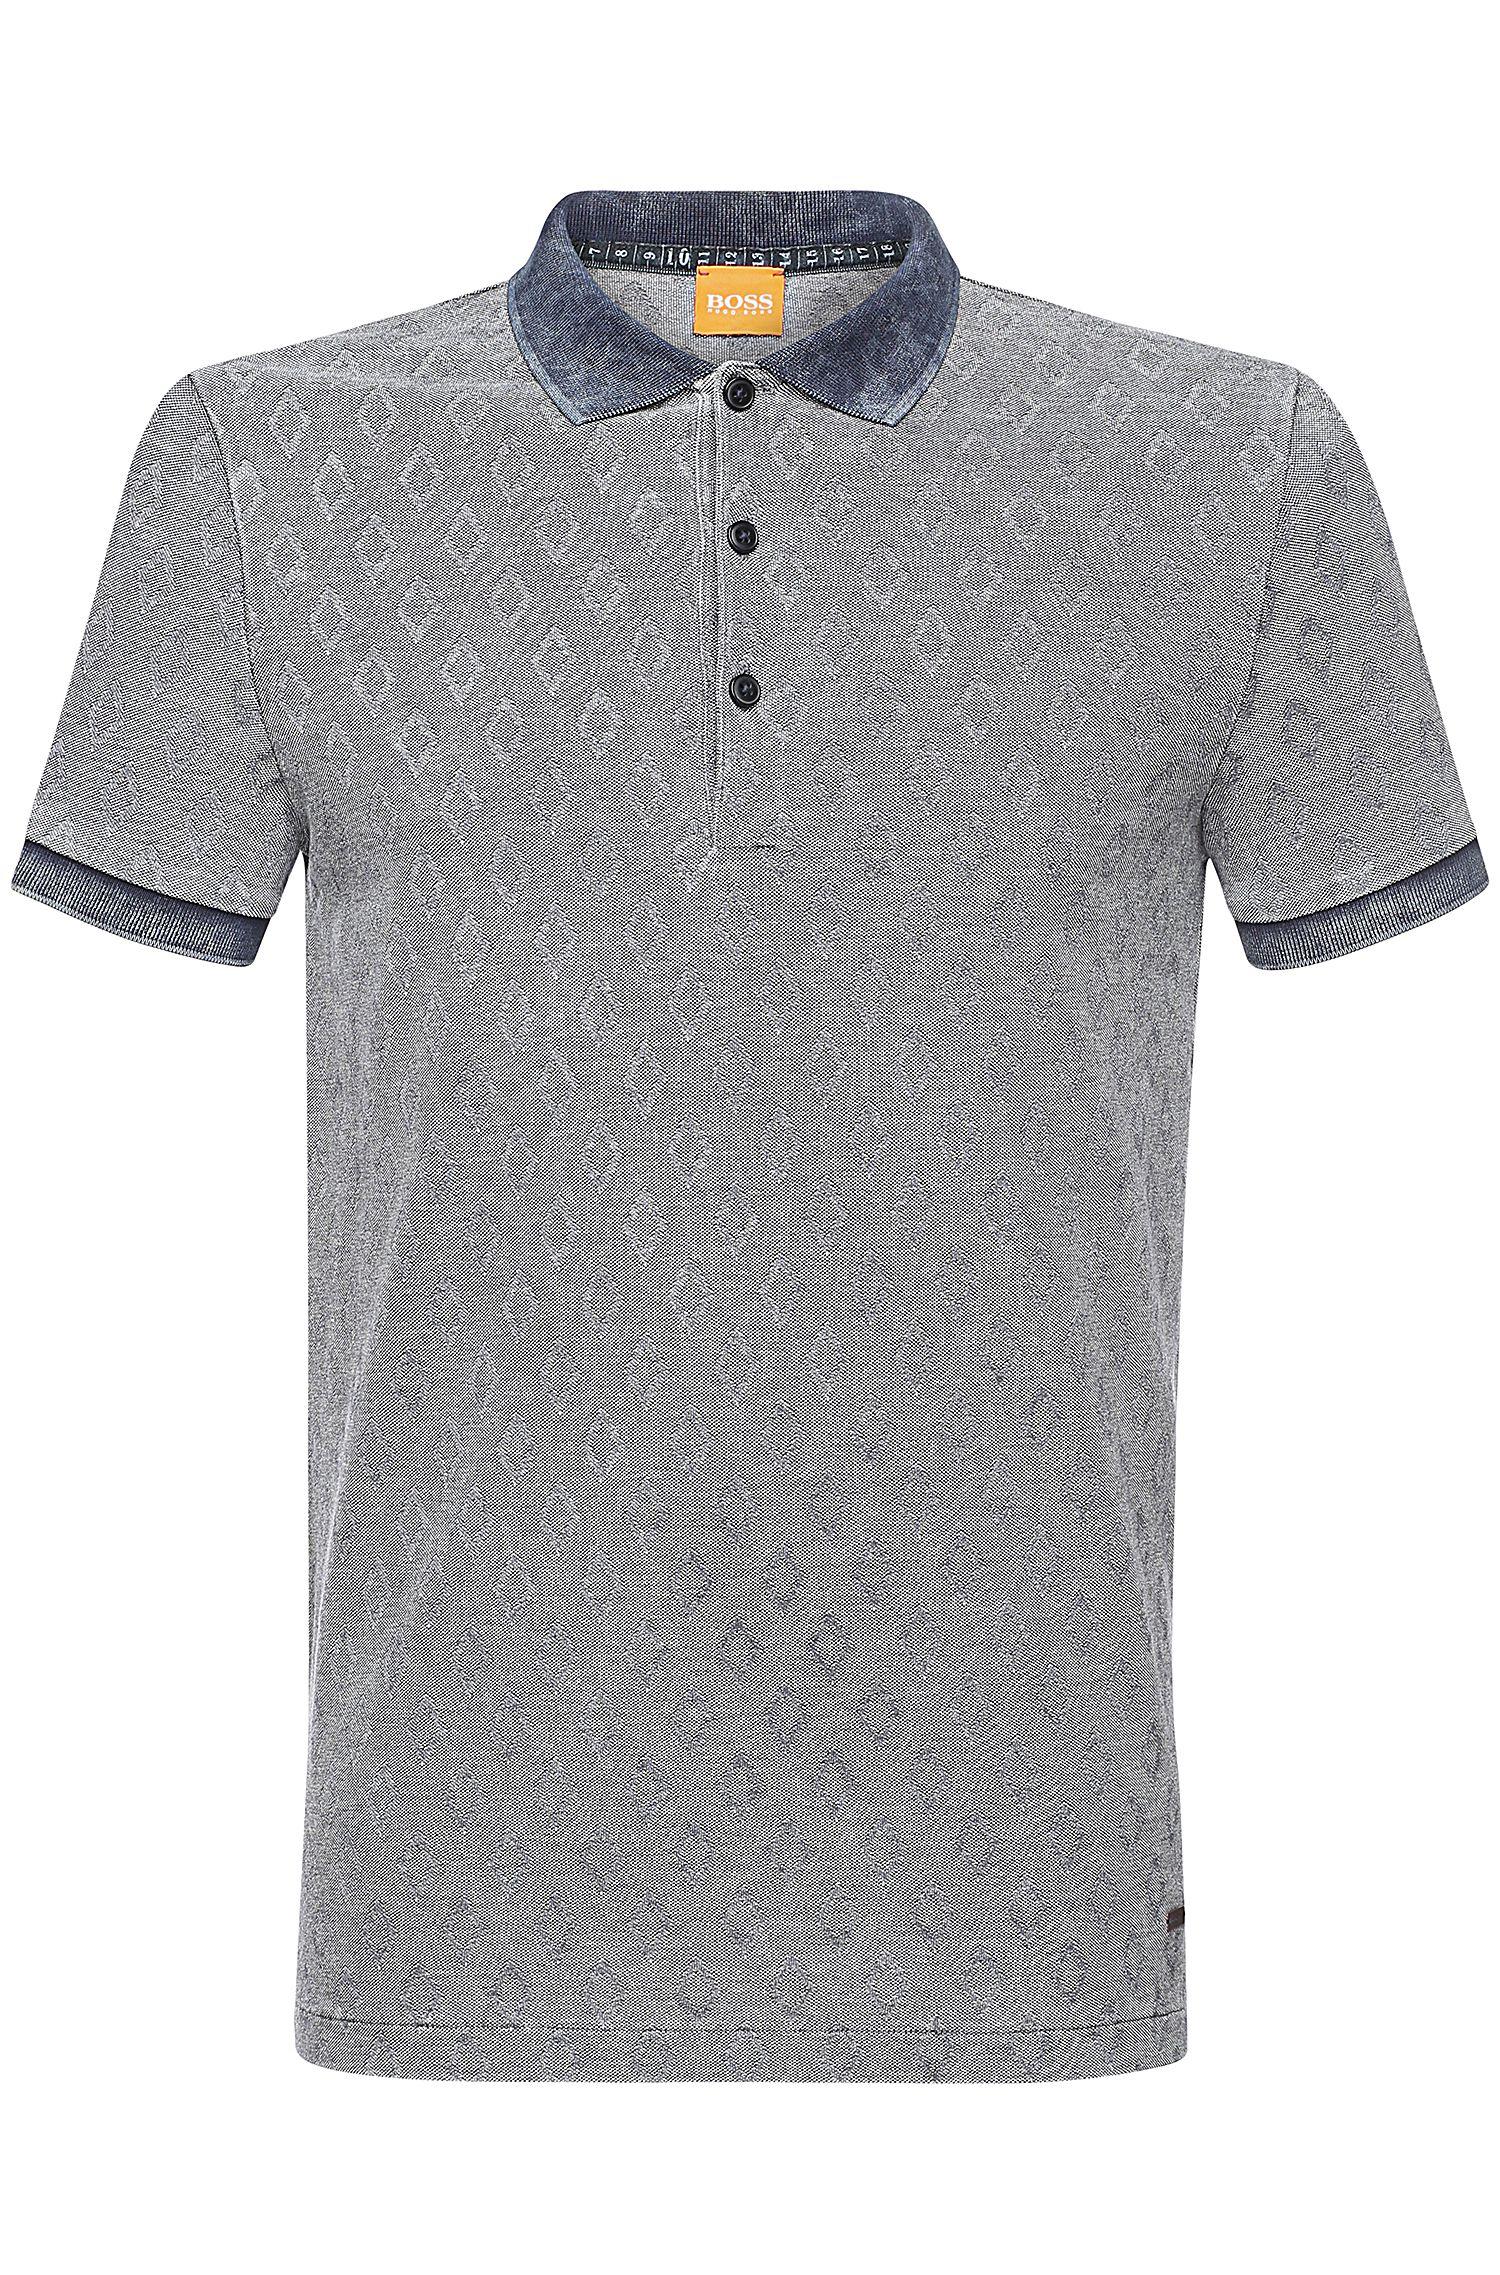 'Peppard' | Slim Fit, Cotto Jacquard Polo Shirt